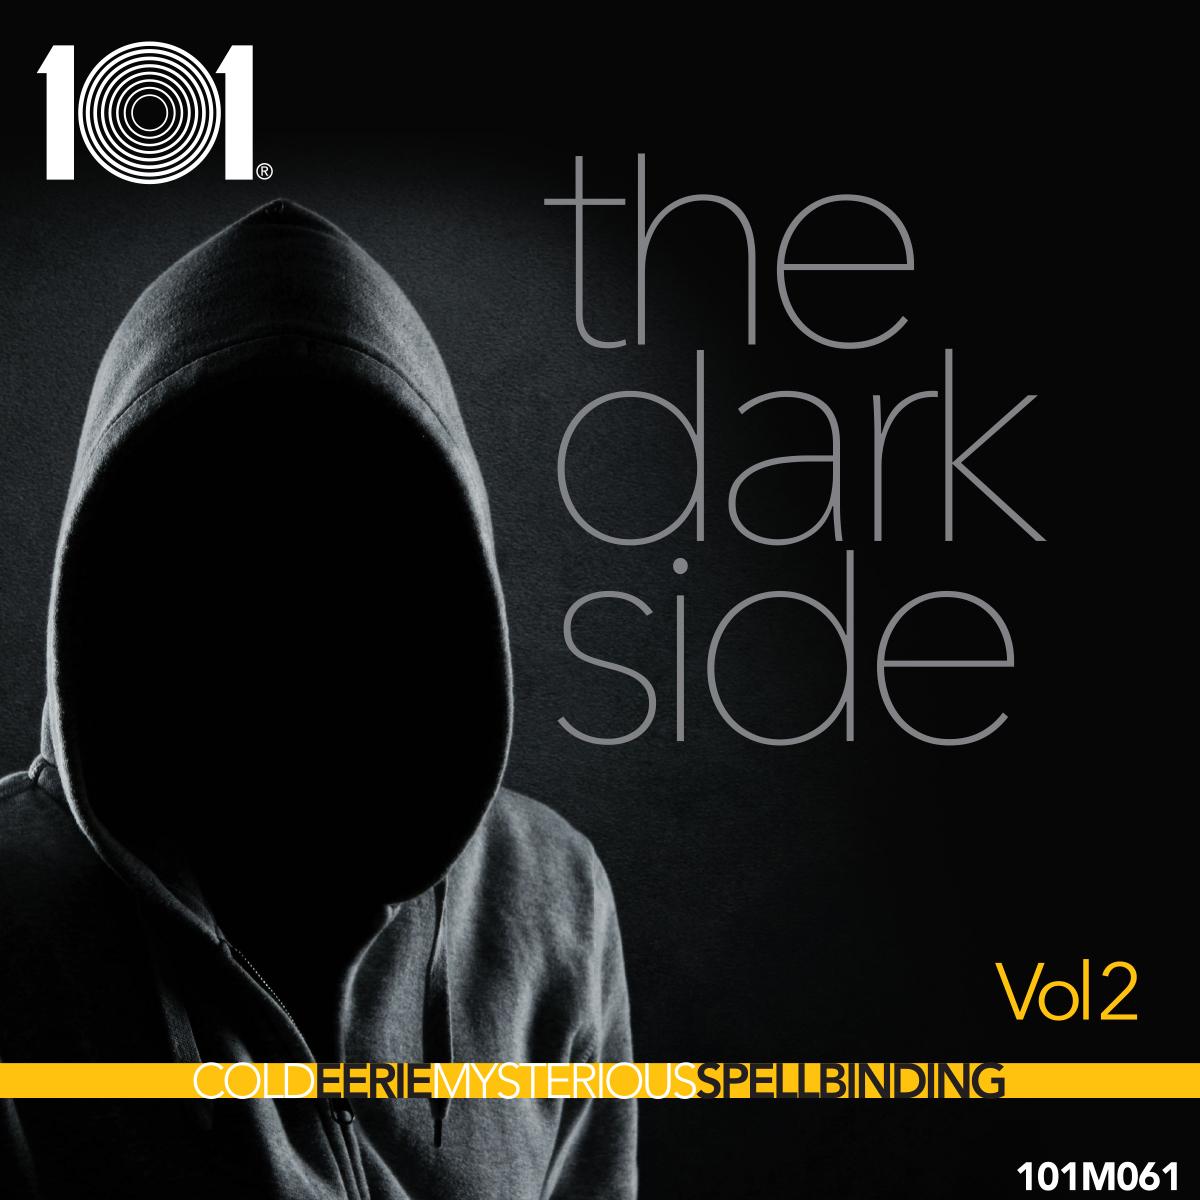 101M061 The Dark Side Vol 2 (main album cover)_1200